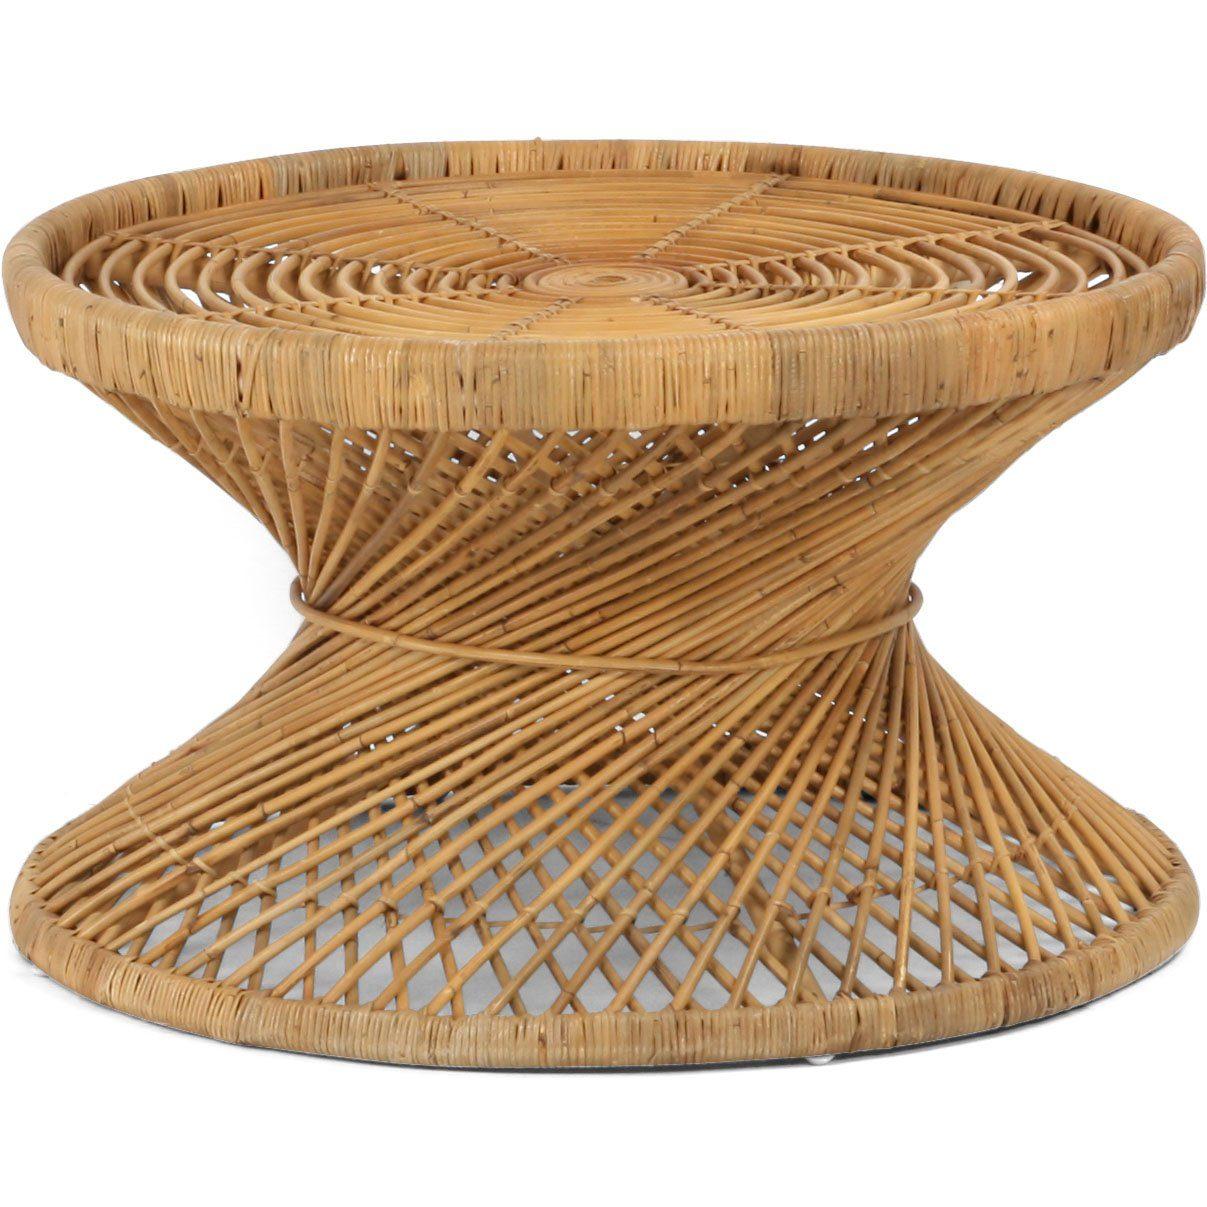 Rottingbord från Tine k med diametern 80 cm.